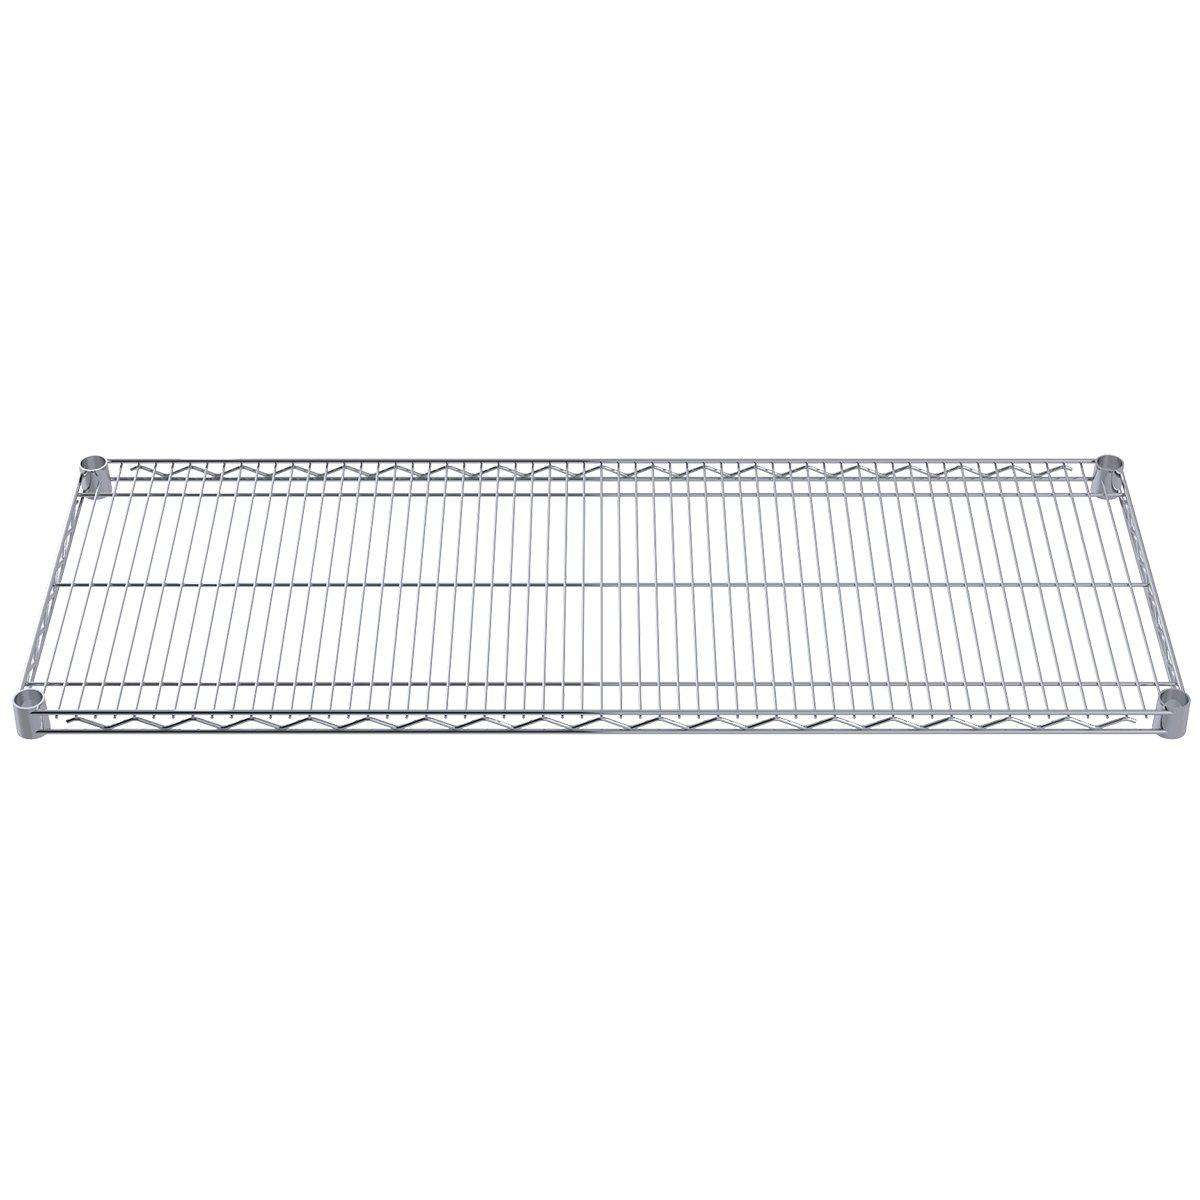 Akro-Mils AWS1848SHELF 18-Inch X 48-Inch NSF Approved Industrial Grade Chrome Wire Shelf, 4-Pack